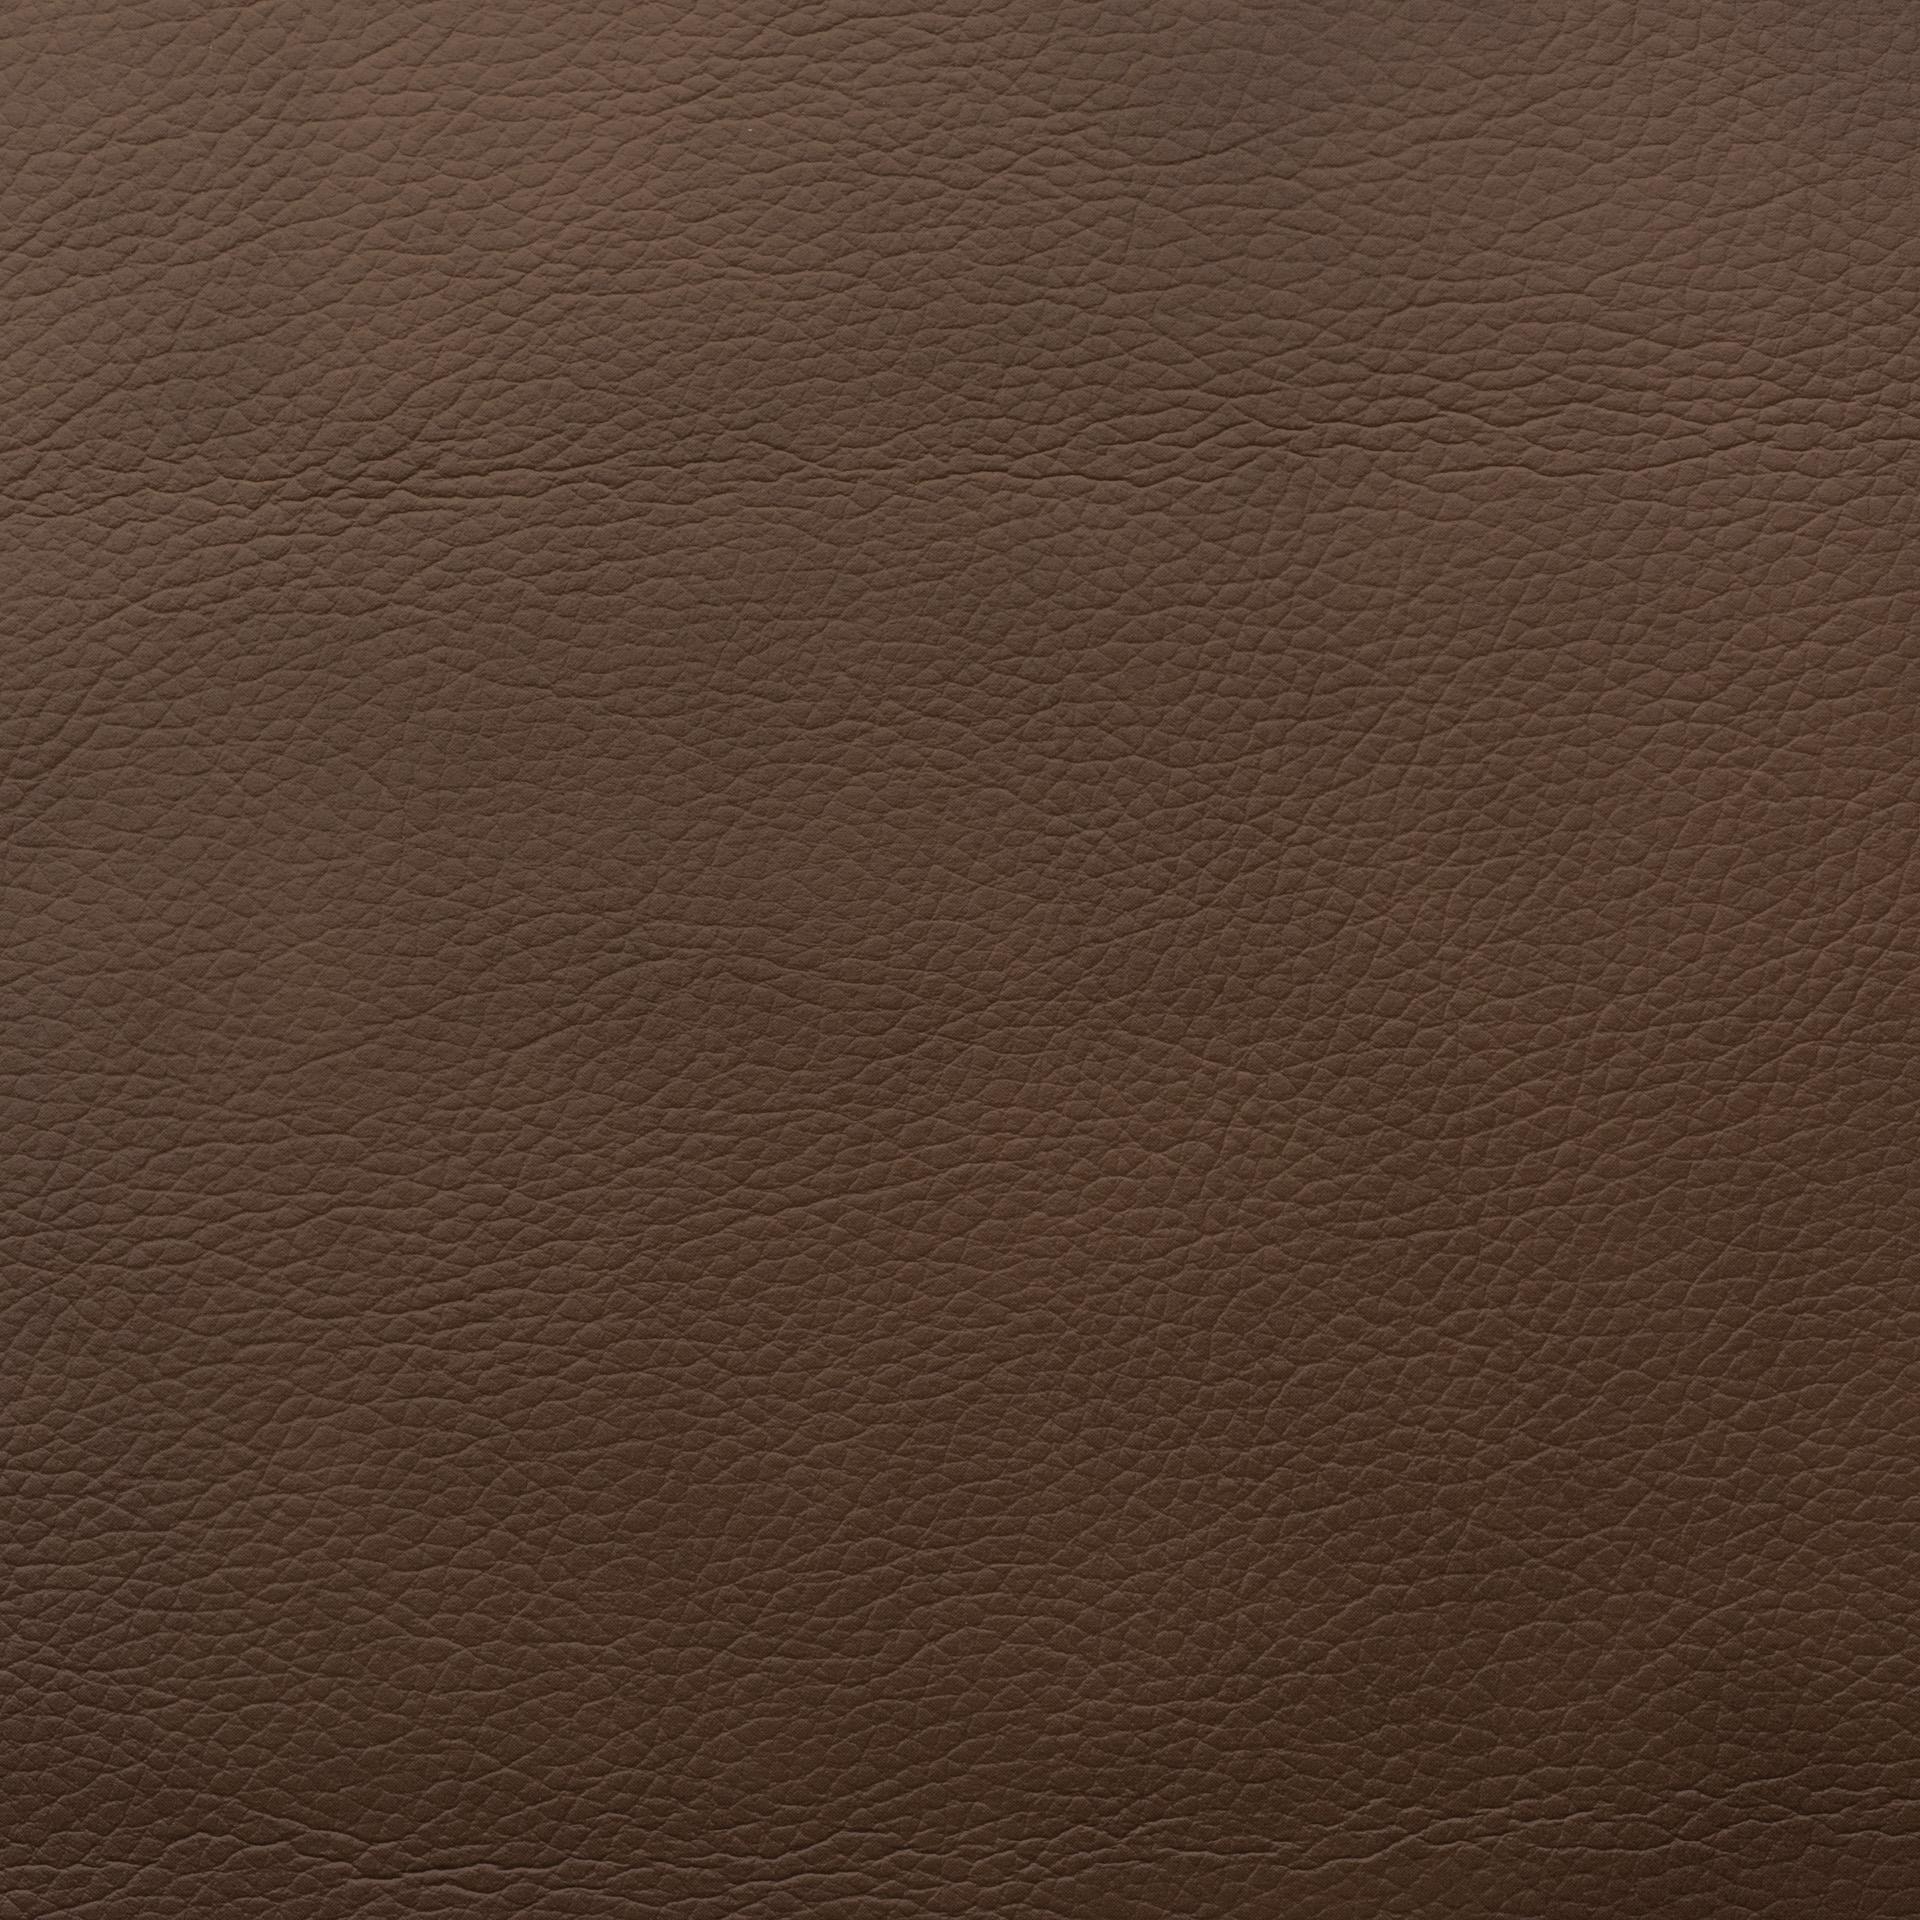 Коллекция ткани Леонардо Каппеллини 03 SWEET WALNUT,  купить ткань Кож зам для мебели Украина